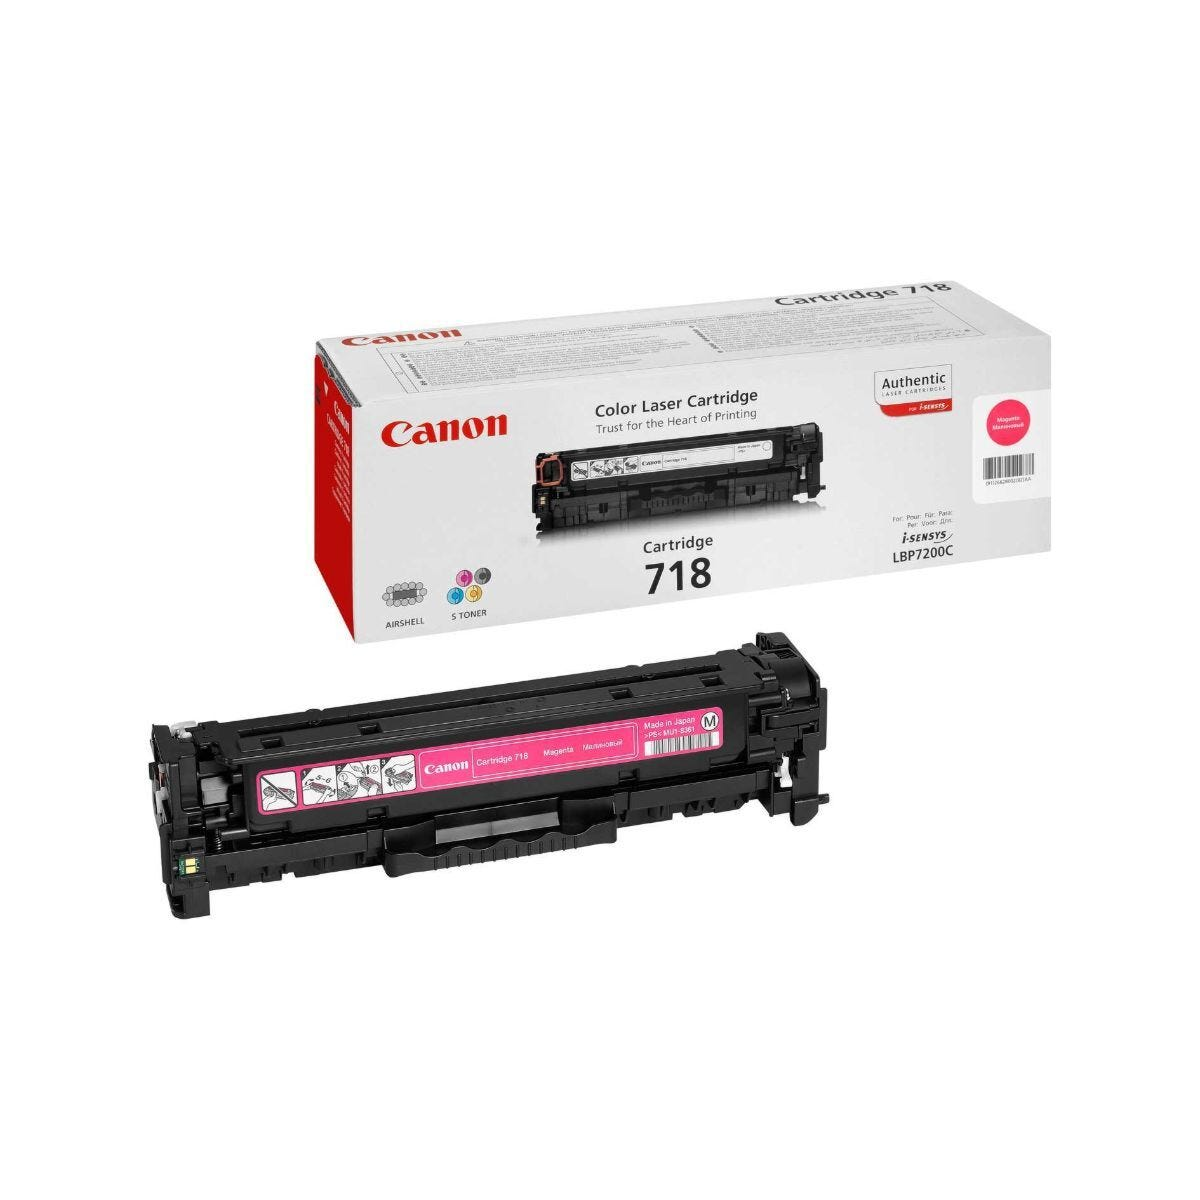 Canon 718 Printer Ink Toner Cartridge 2660B002AA